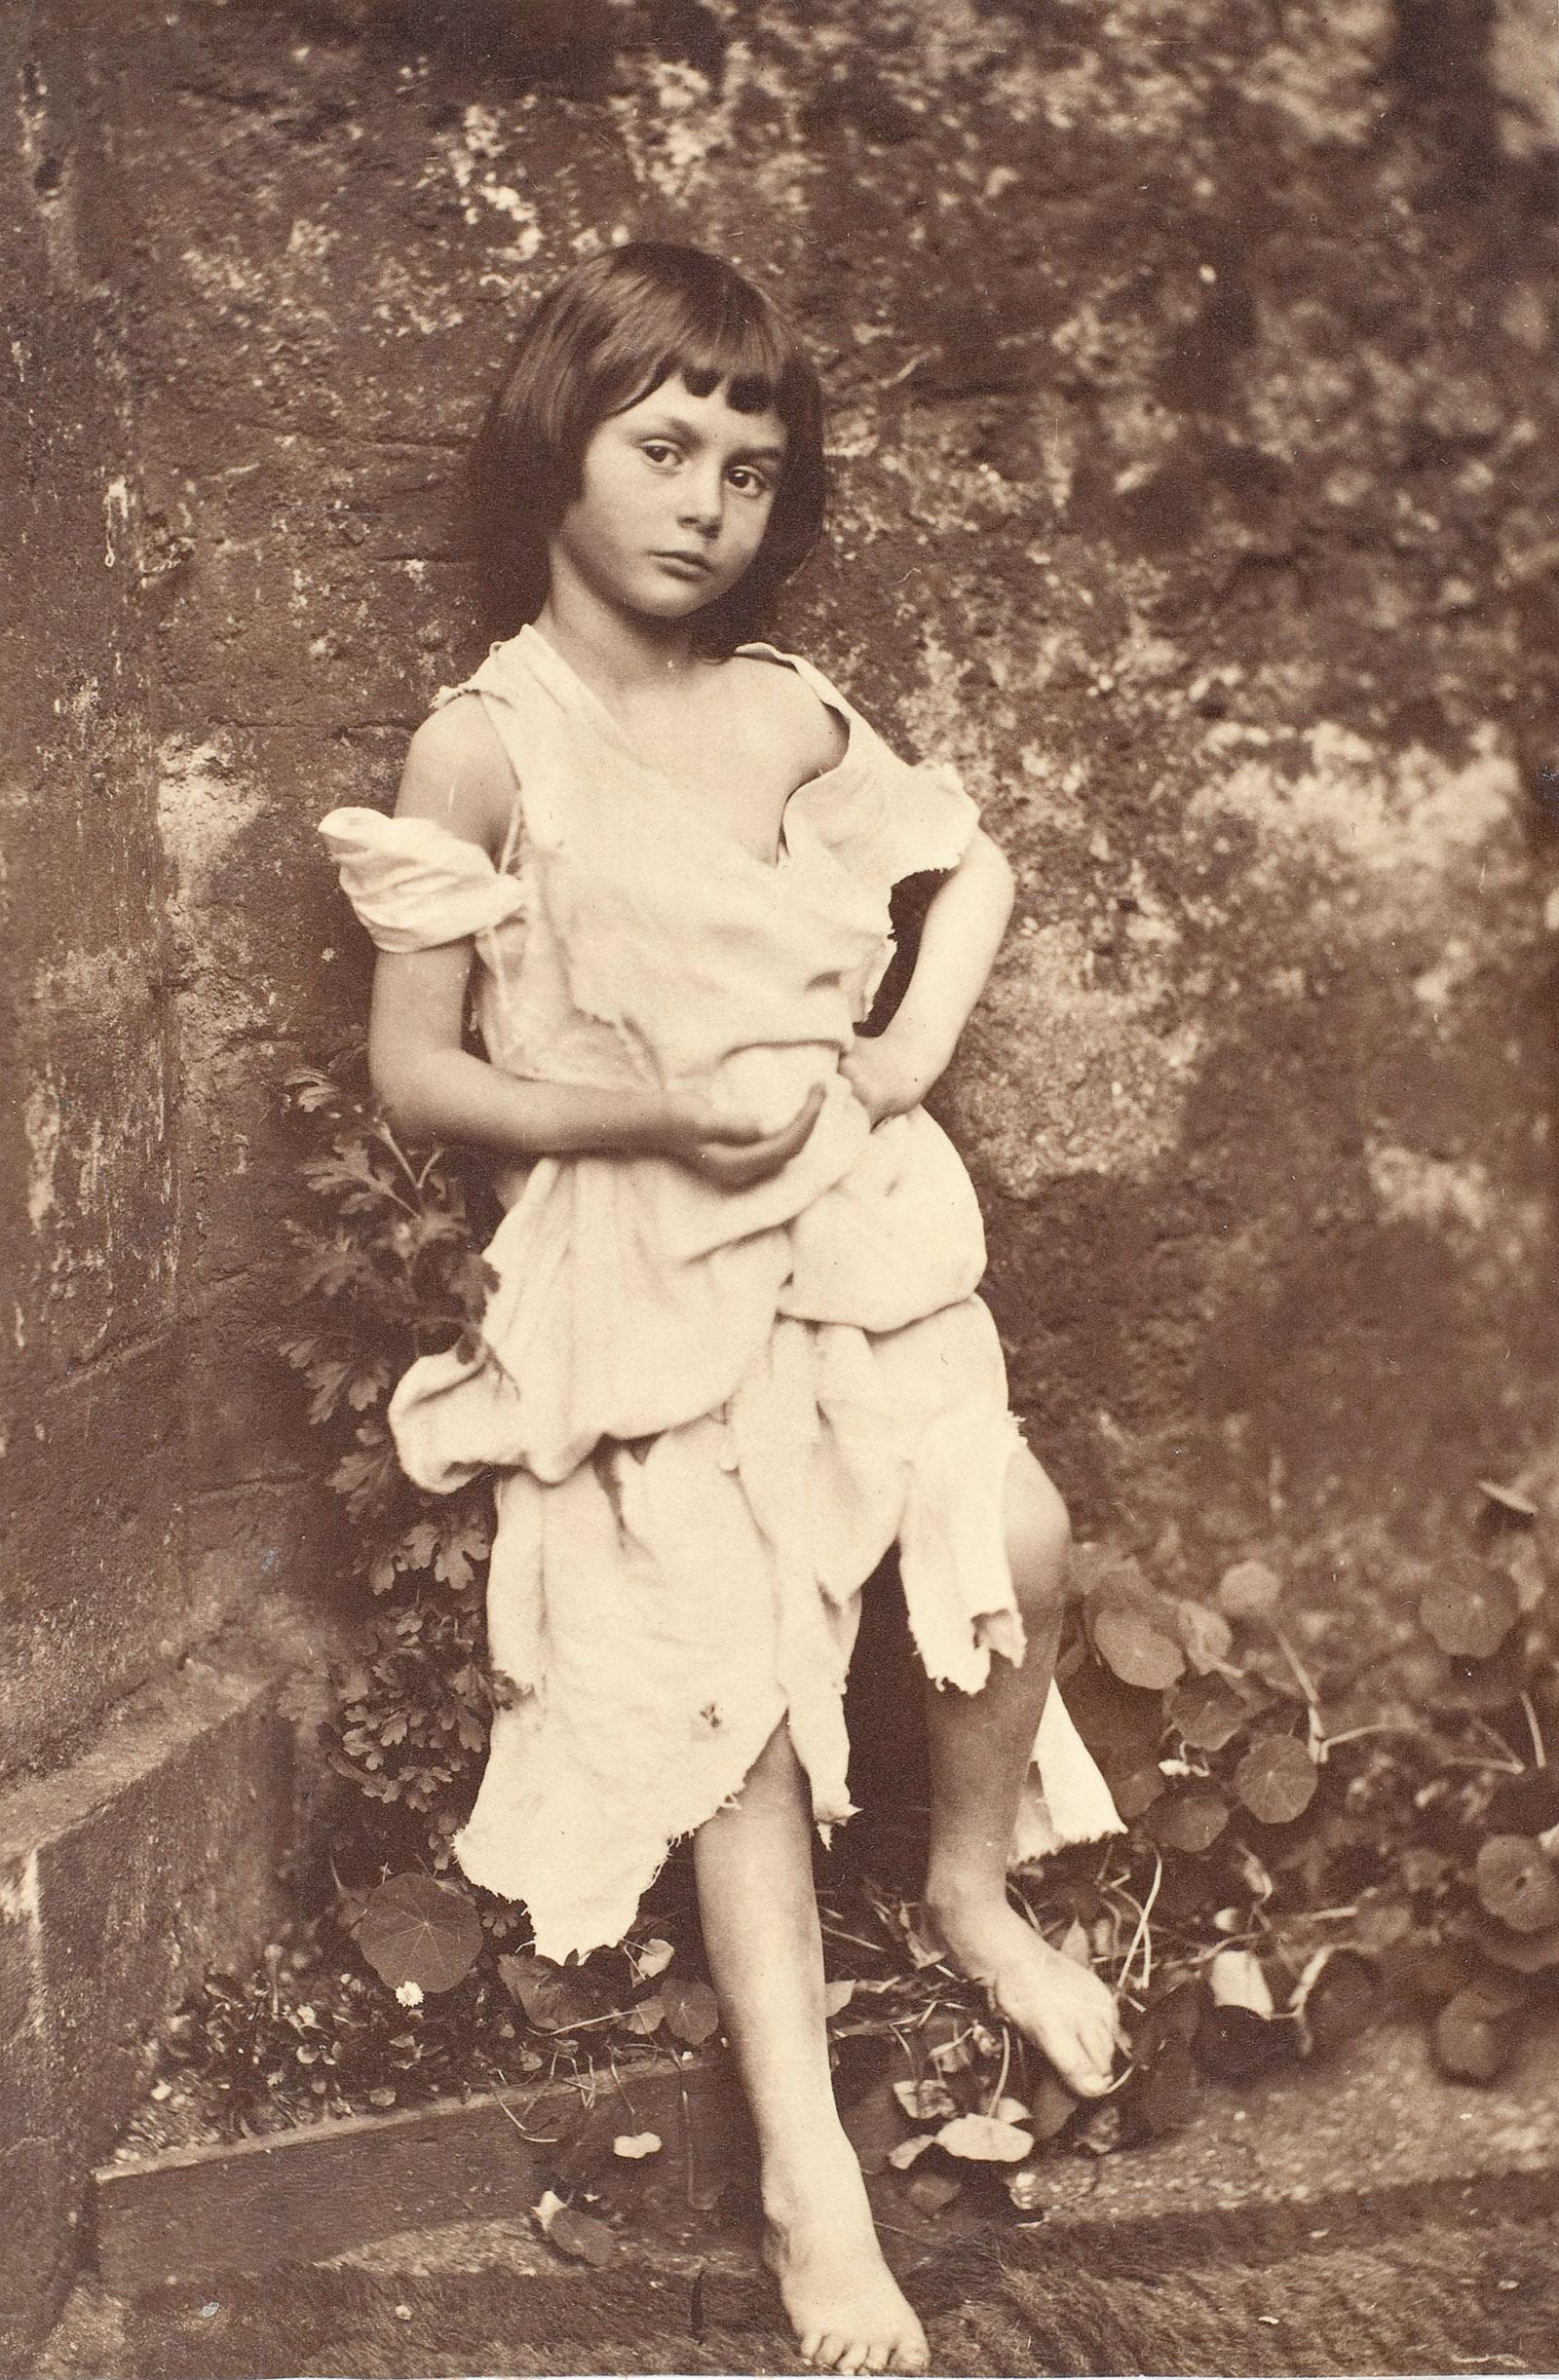 Charles Dodgson (Lewis Carroll): Alice Liddell as a Beggar Child, 1858